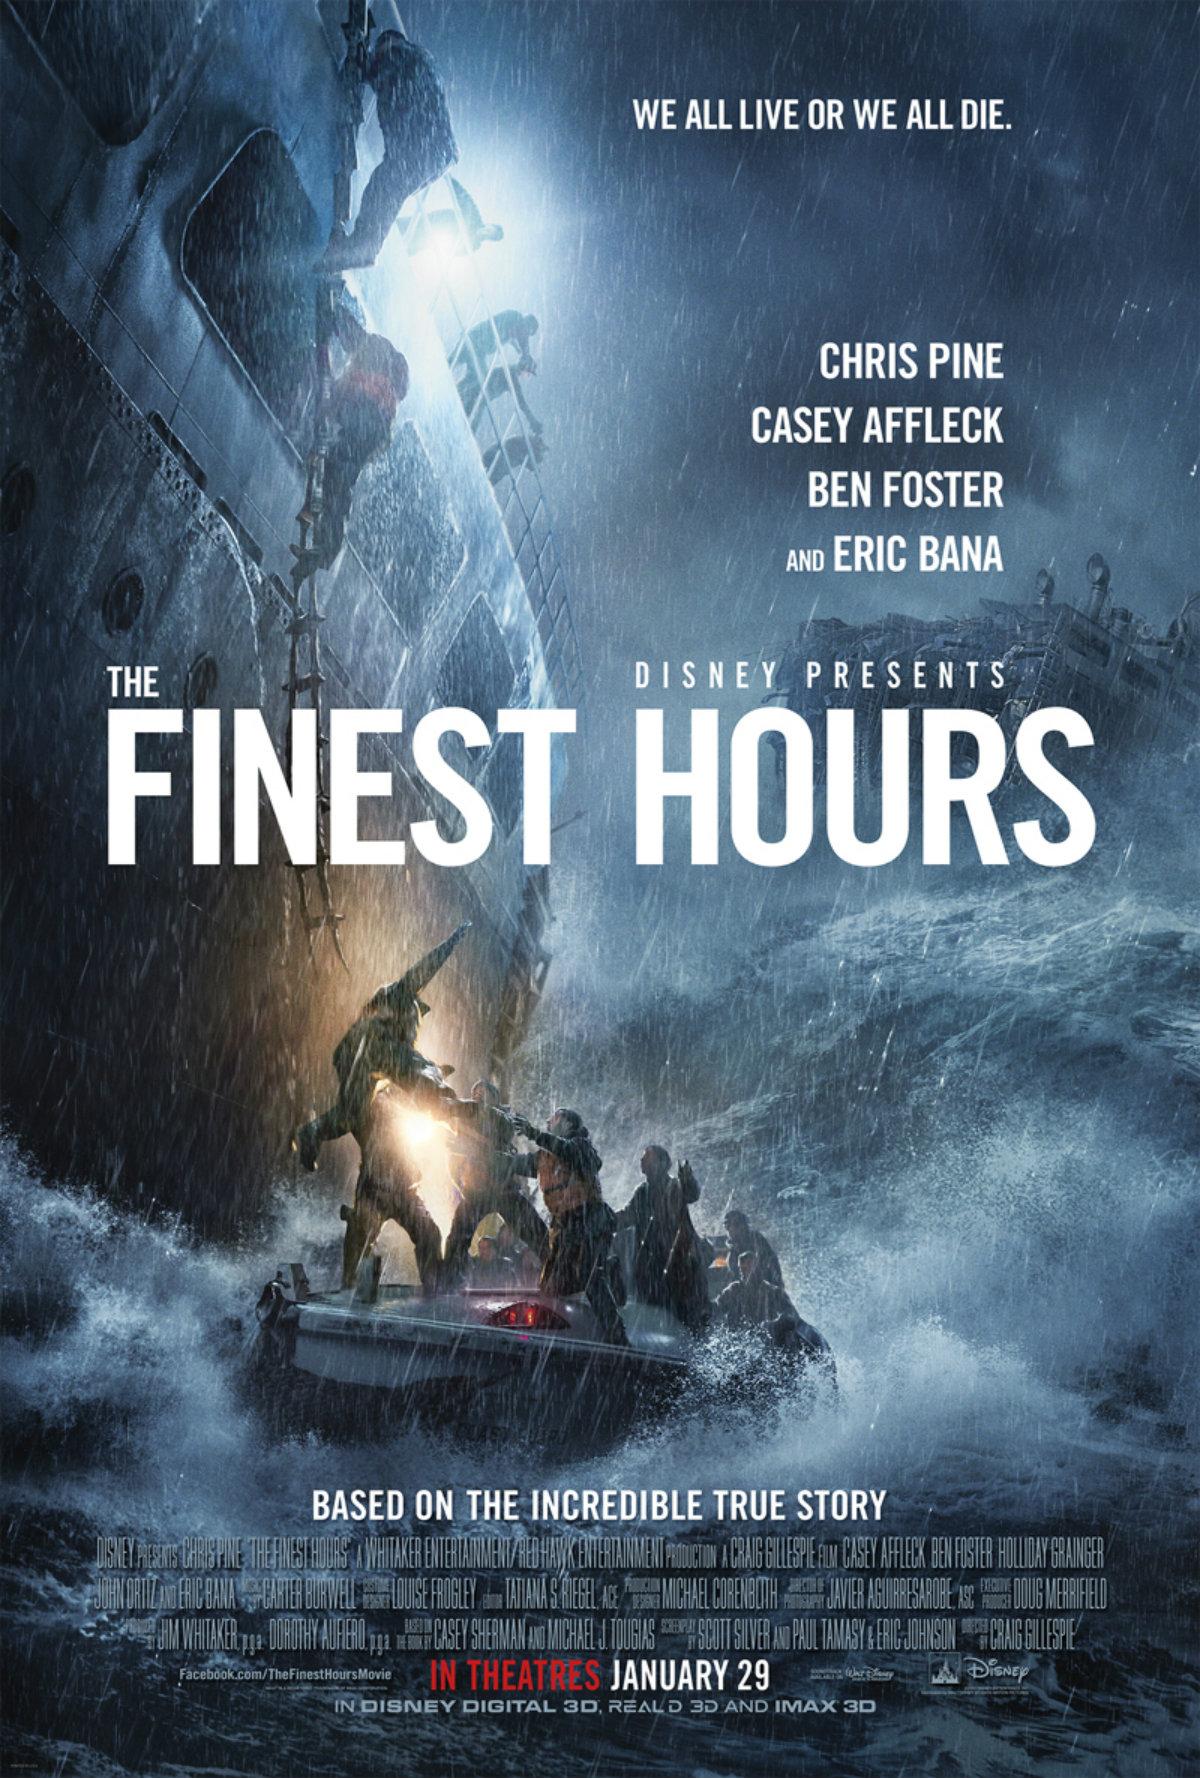 the finest hours (2016)dvdplanetstorepk